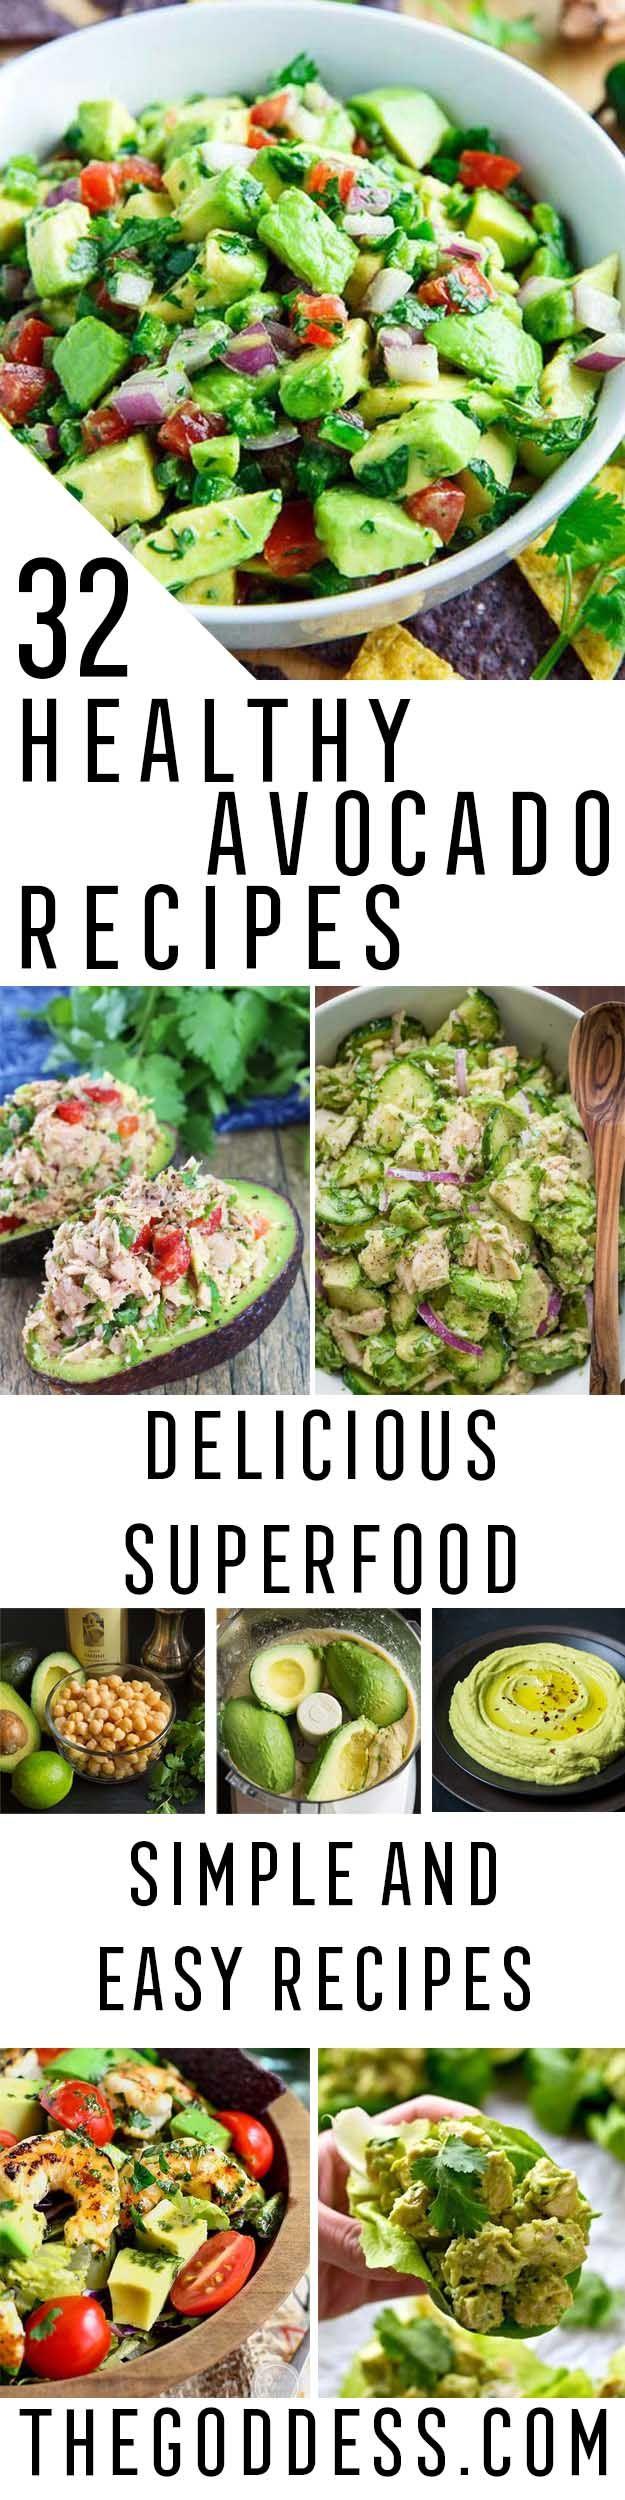 32 Healthy Avocado Recipes The Goddess Avocado Recipes Healthy Vegetarian Snacks Stuffed Avocado Healthy